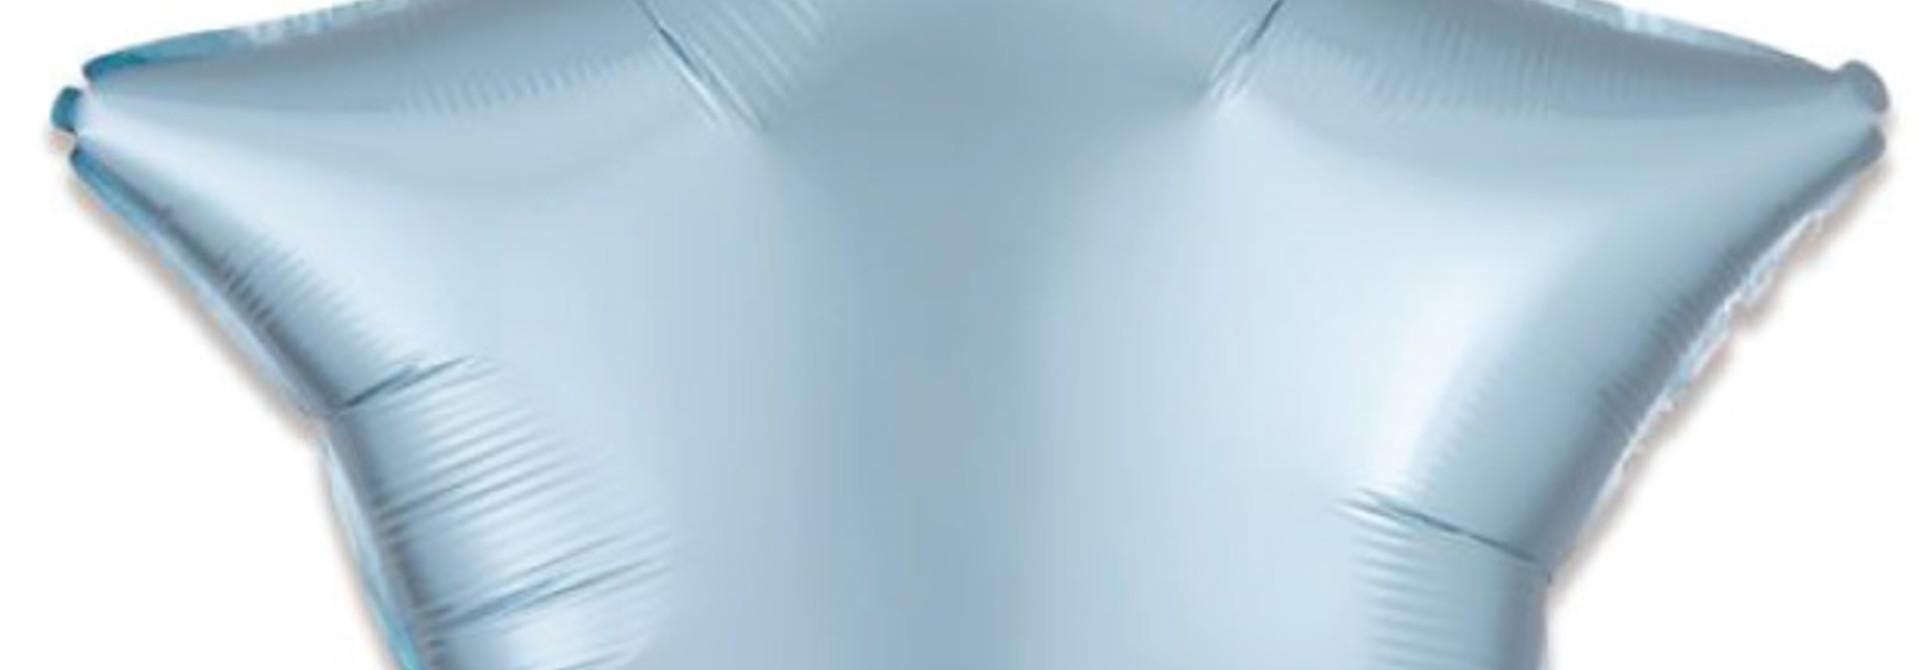 Folieballon satin luxe ster pastel blauw (43 cm)